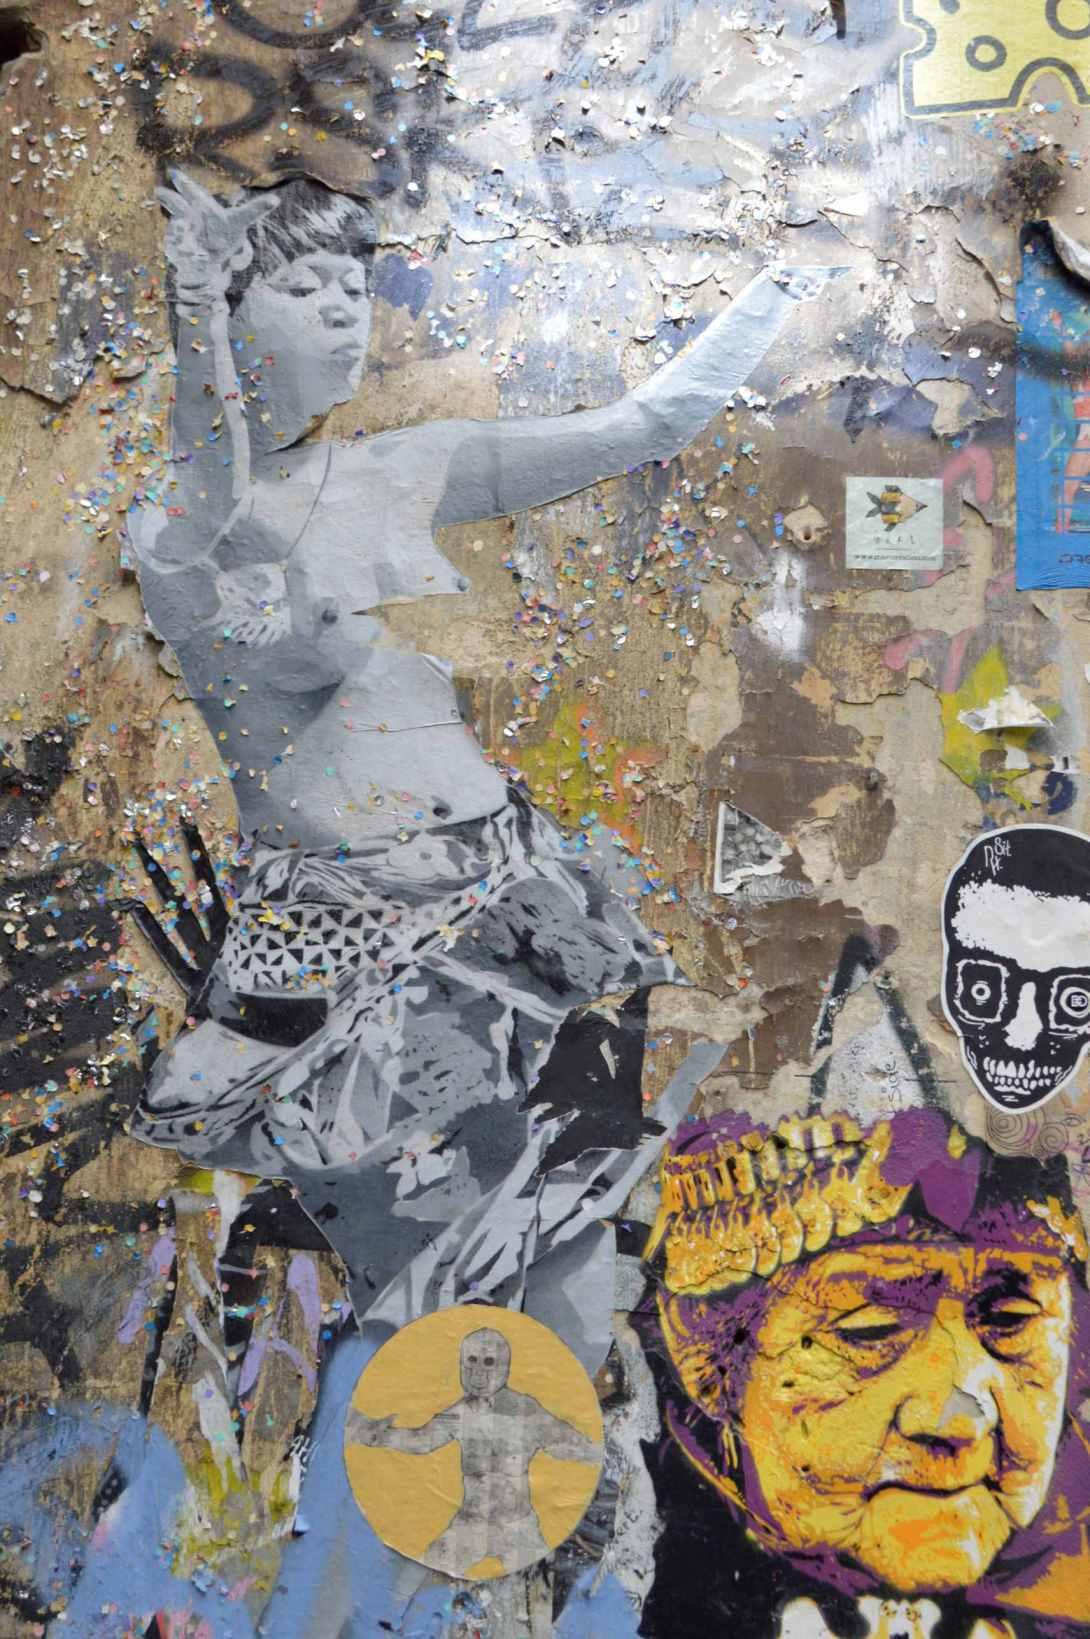 SOBR street art alley hackescher markt berlin